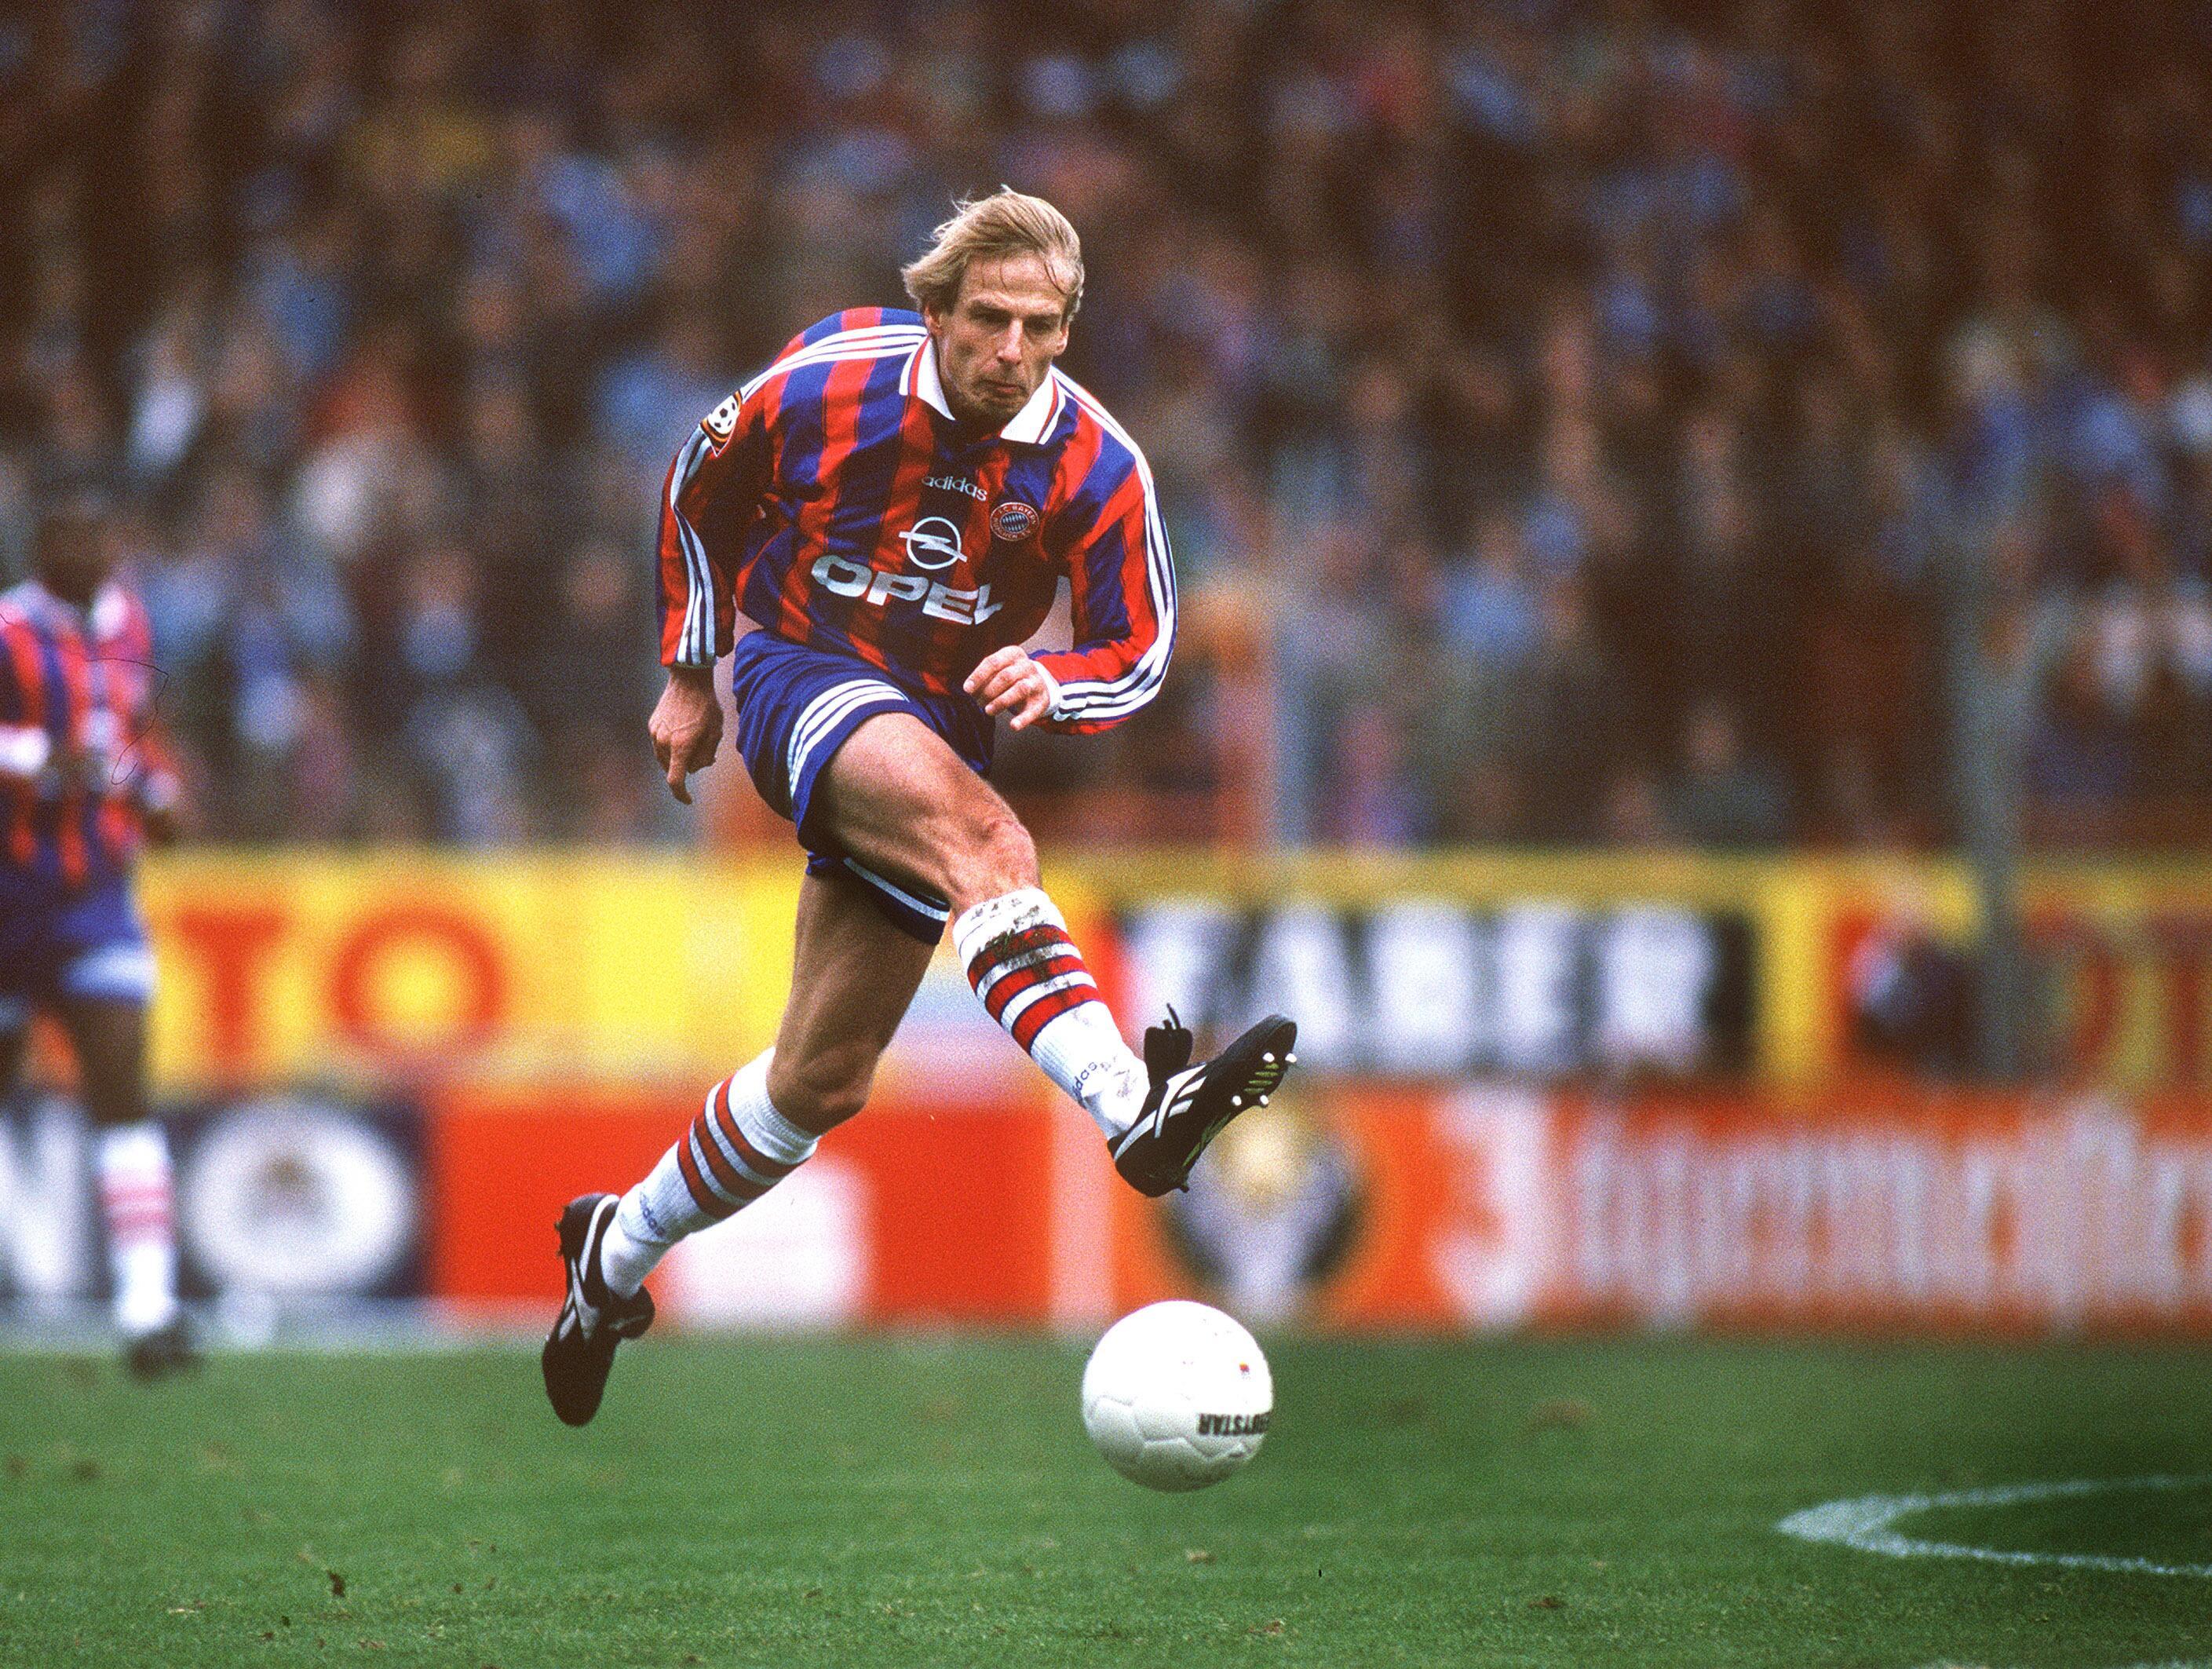 Bild zu Jürgen Klinsmann, FC Bayern München, VfL Bochum, Ruhrstadion, Bundesliga, 1996/97